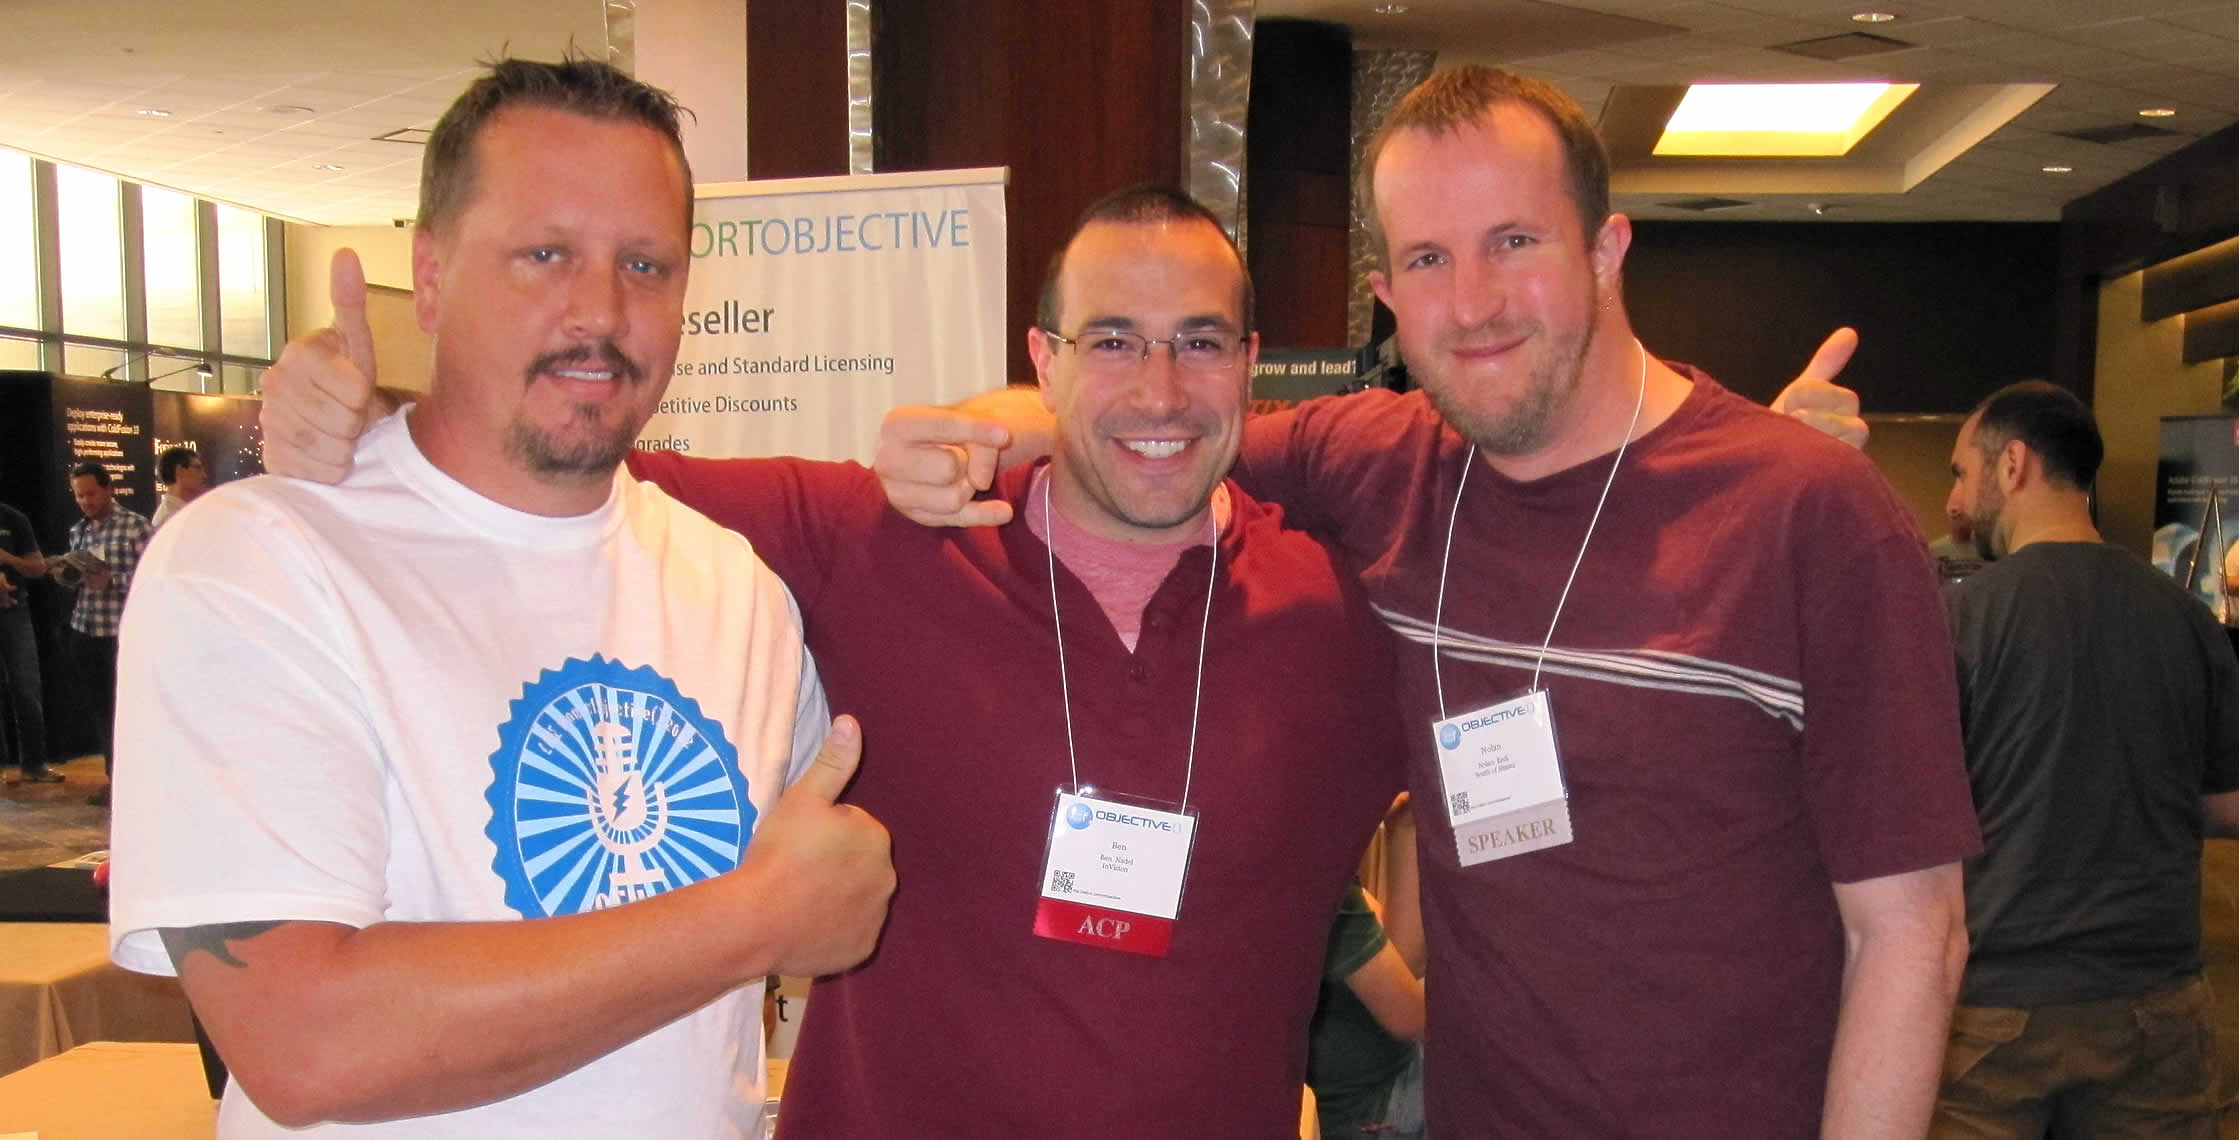 Ben Nadel at cf.Objective() 2012 (Minneapolis, MN) with: Matt Graf and Nolan Erck